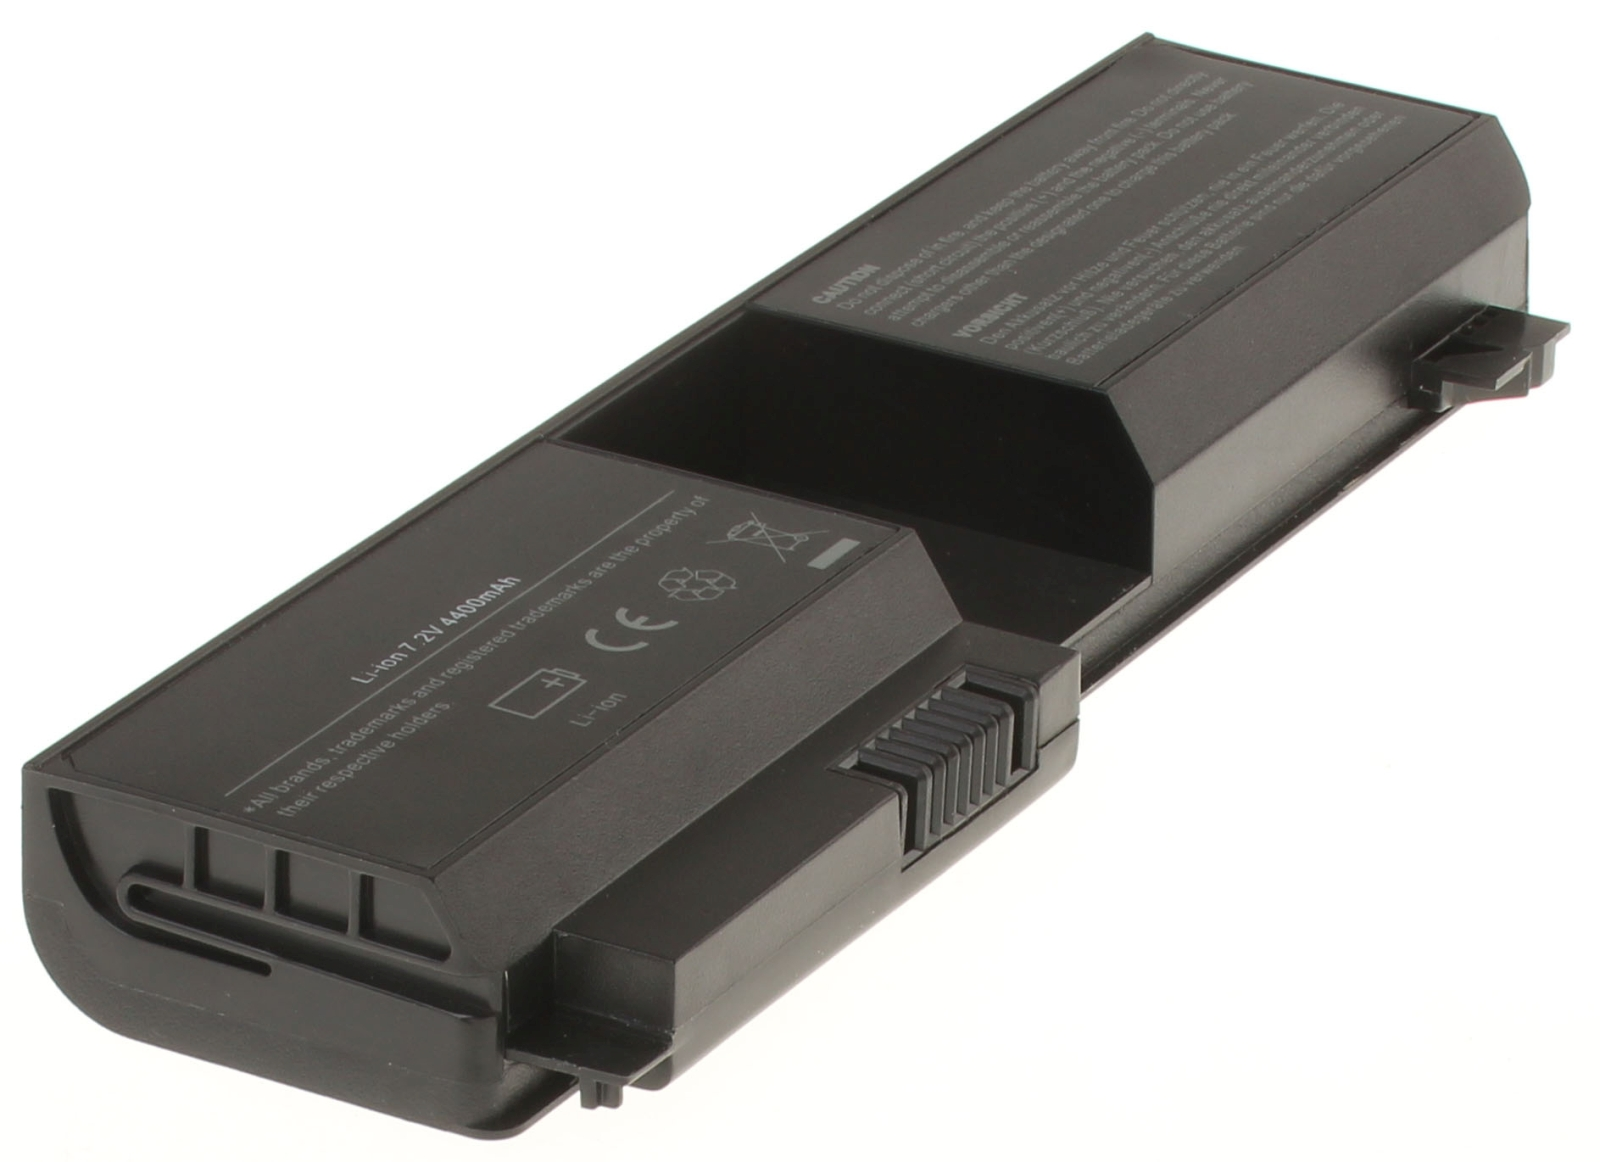 Аккумуляторная батарея HSTNN-OB41 для ноутбуков HP-Compaq. Артикул iB-A281.Емкость (mAh): 4400. Напряжение (V): 7,4